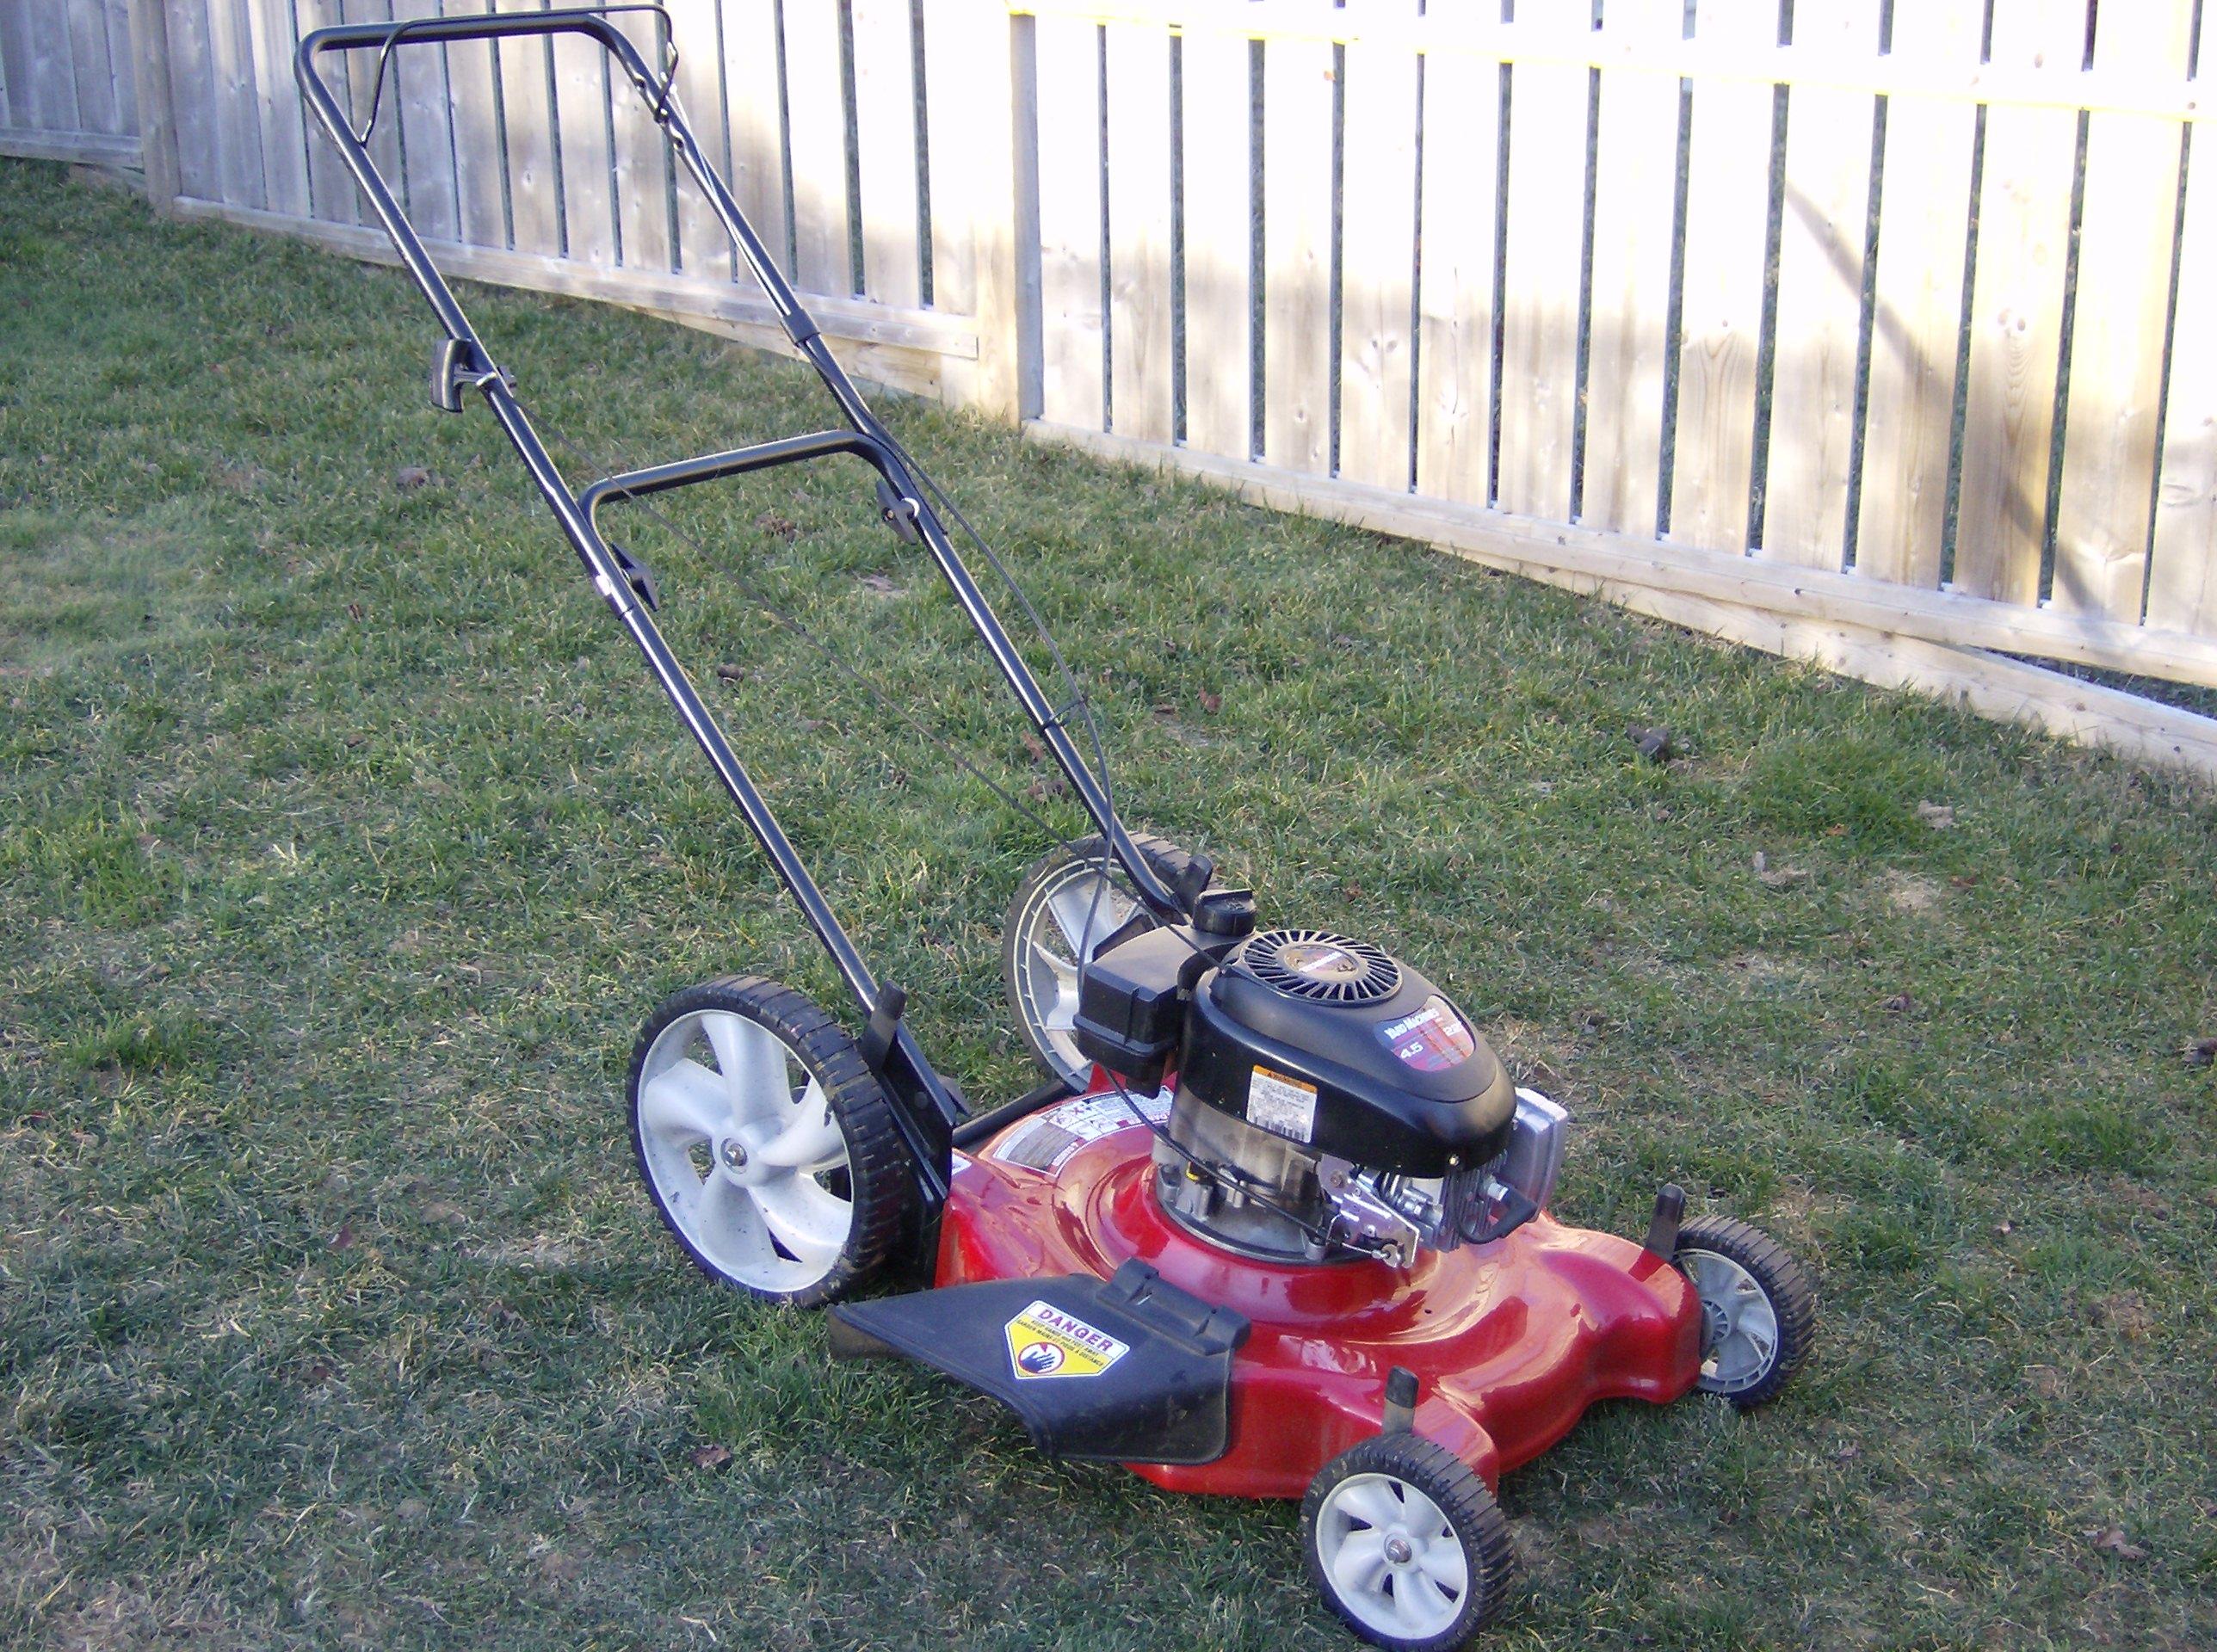 Lawn Mower Diagnostics : Lawn mower repair tips gregs small engine reno tahoe